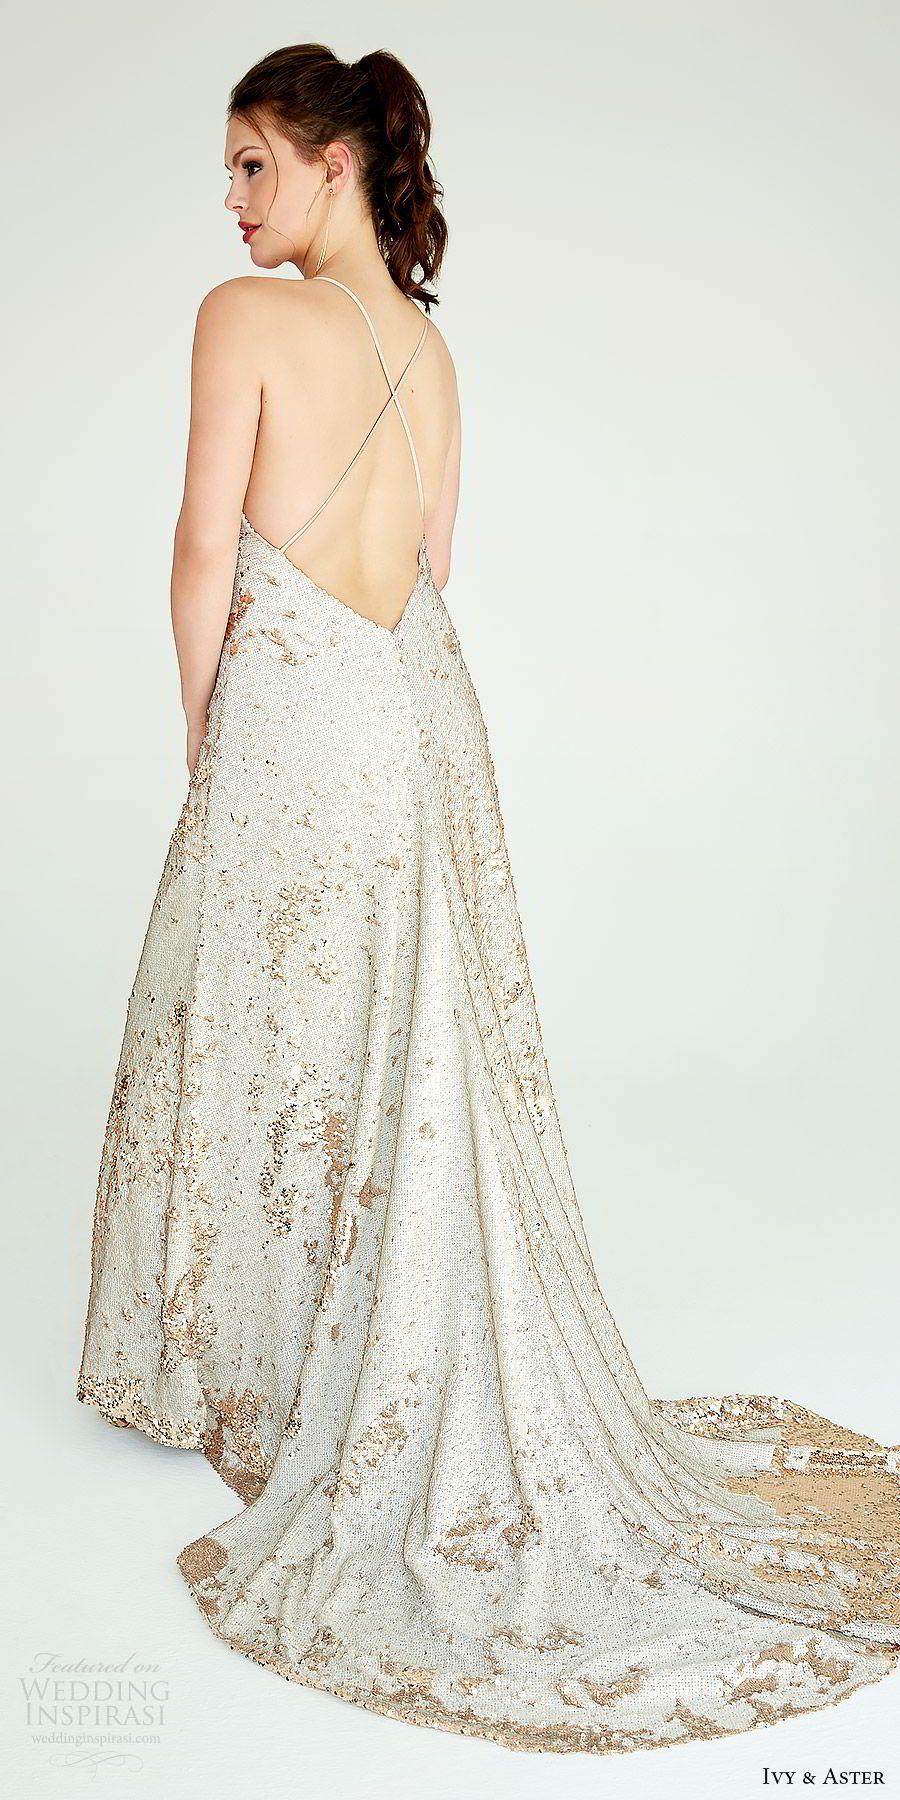 Ivy Aster Spring 2019 Wedding Dresses Ixa Revolution Bridal Collection Wedding Inspirasi Wedding Dresses Dresses Ivy And Aster [ 1800 x 900 Pixel ]